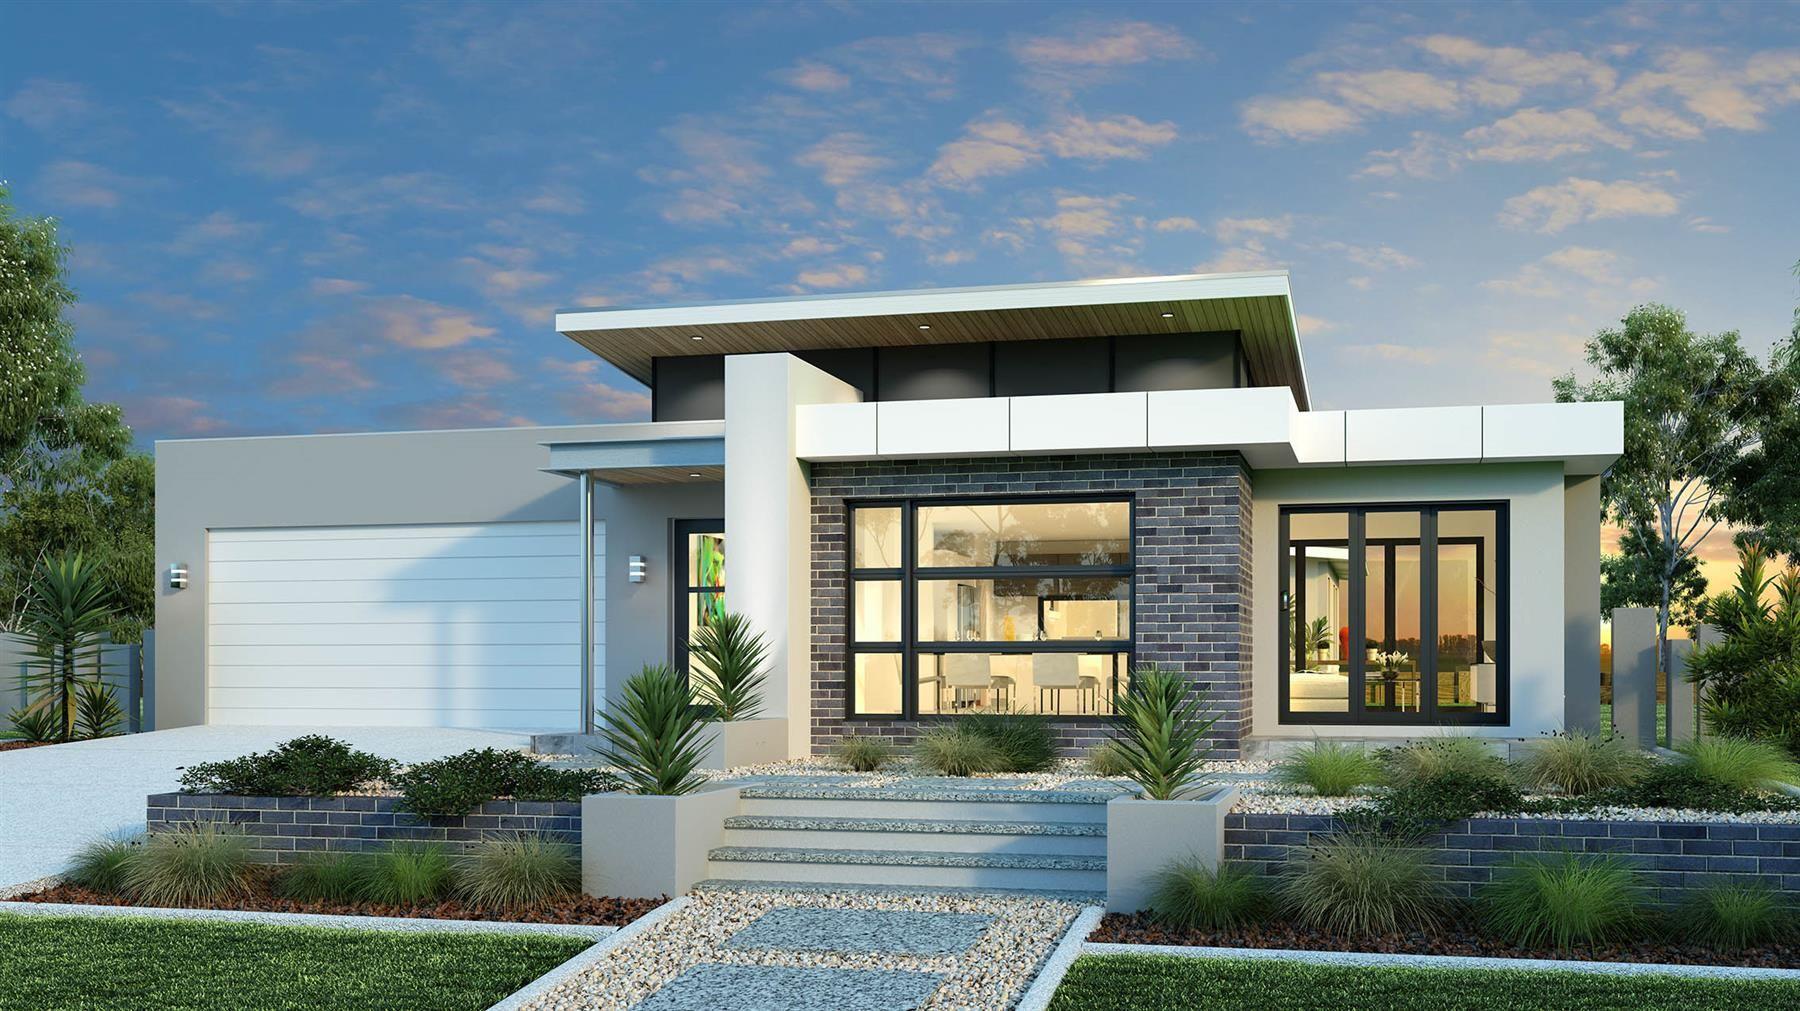 Lakeview 234 Design Ideas Home Designs In Batemans Bay G J Gardner Homes House Exterior Facade House Modern House Exterior